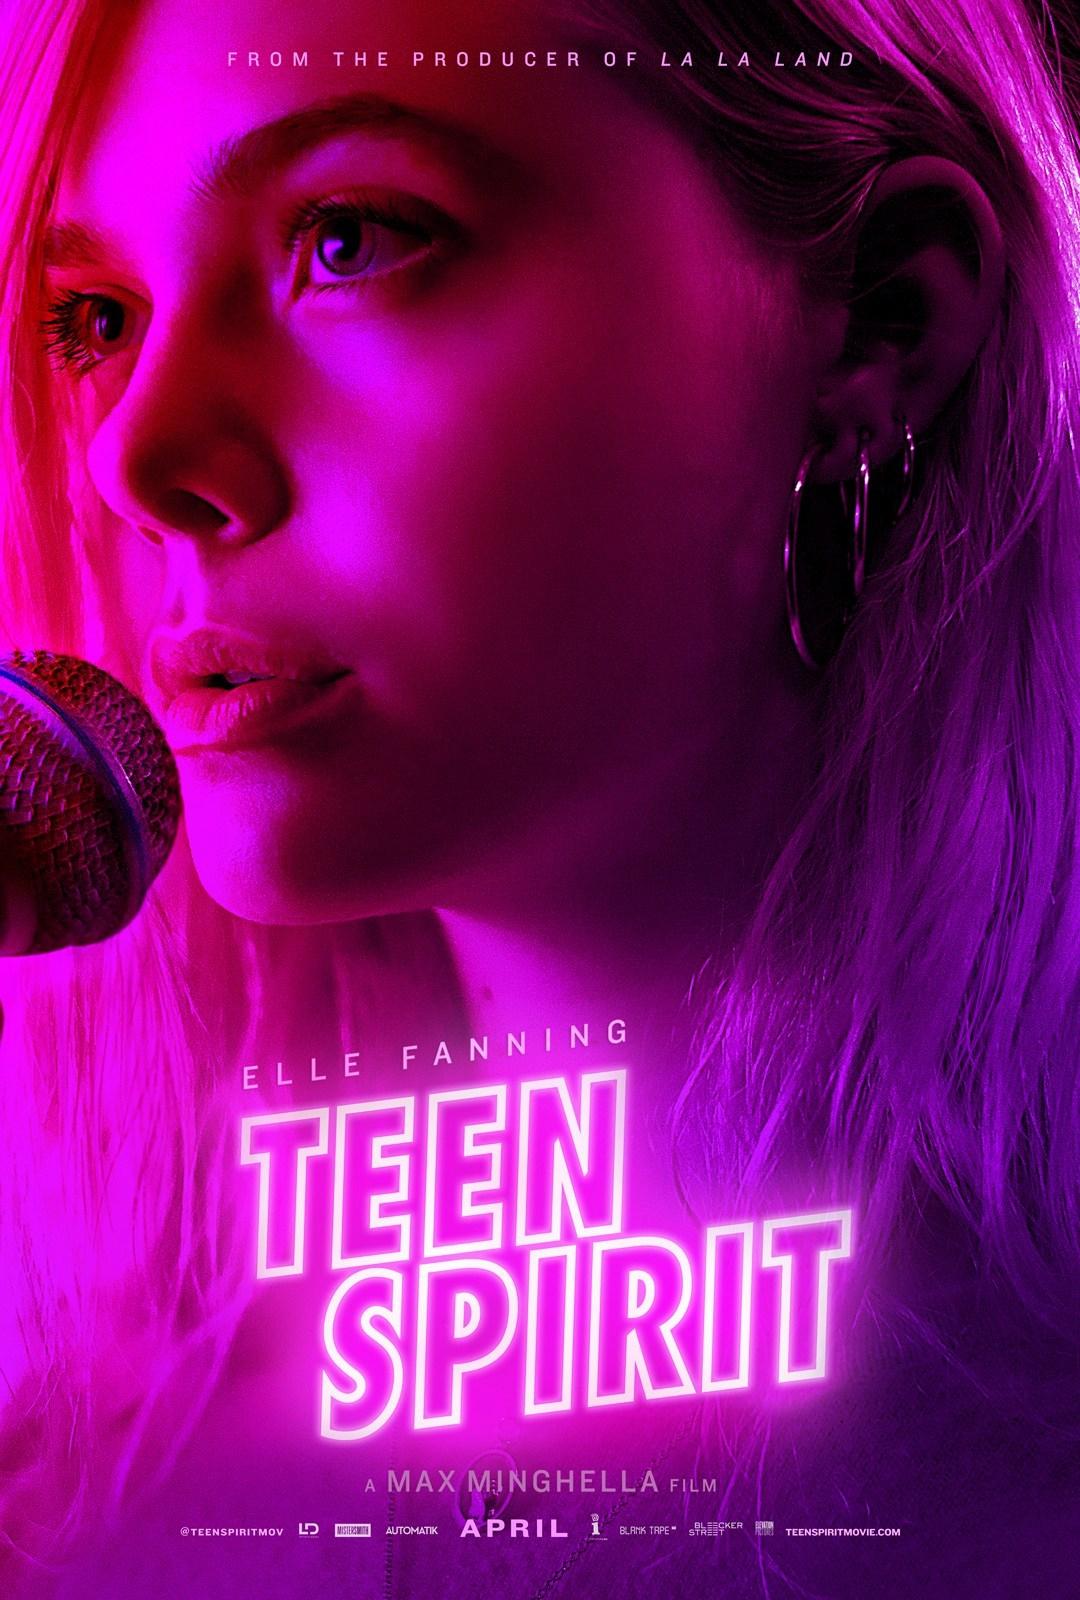 Teen Spirit (2019) Watch Full Video Free Online